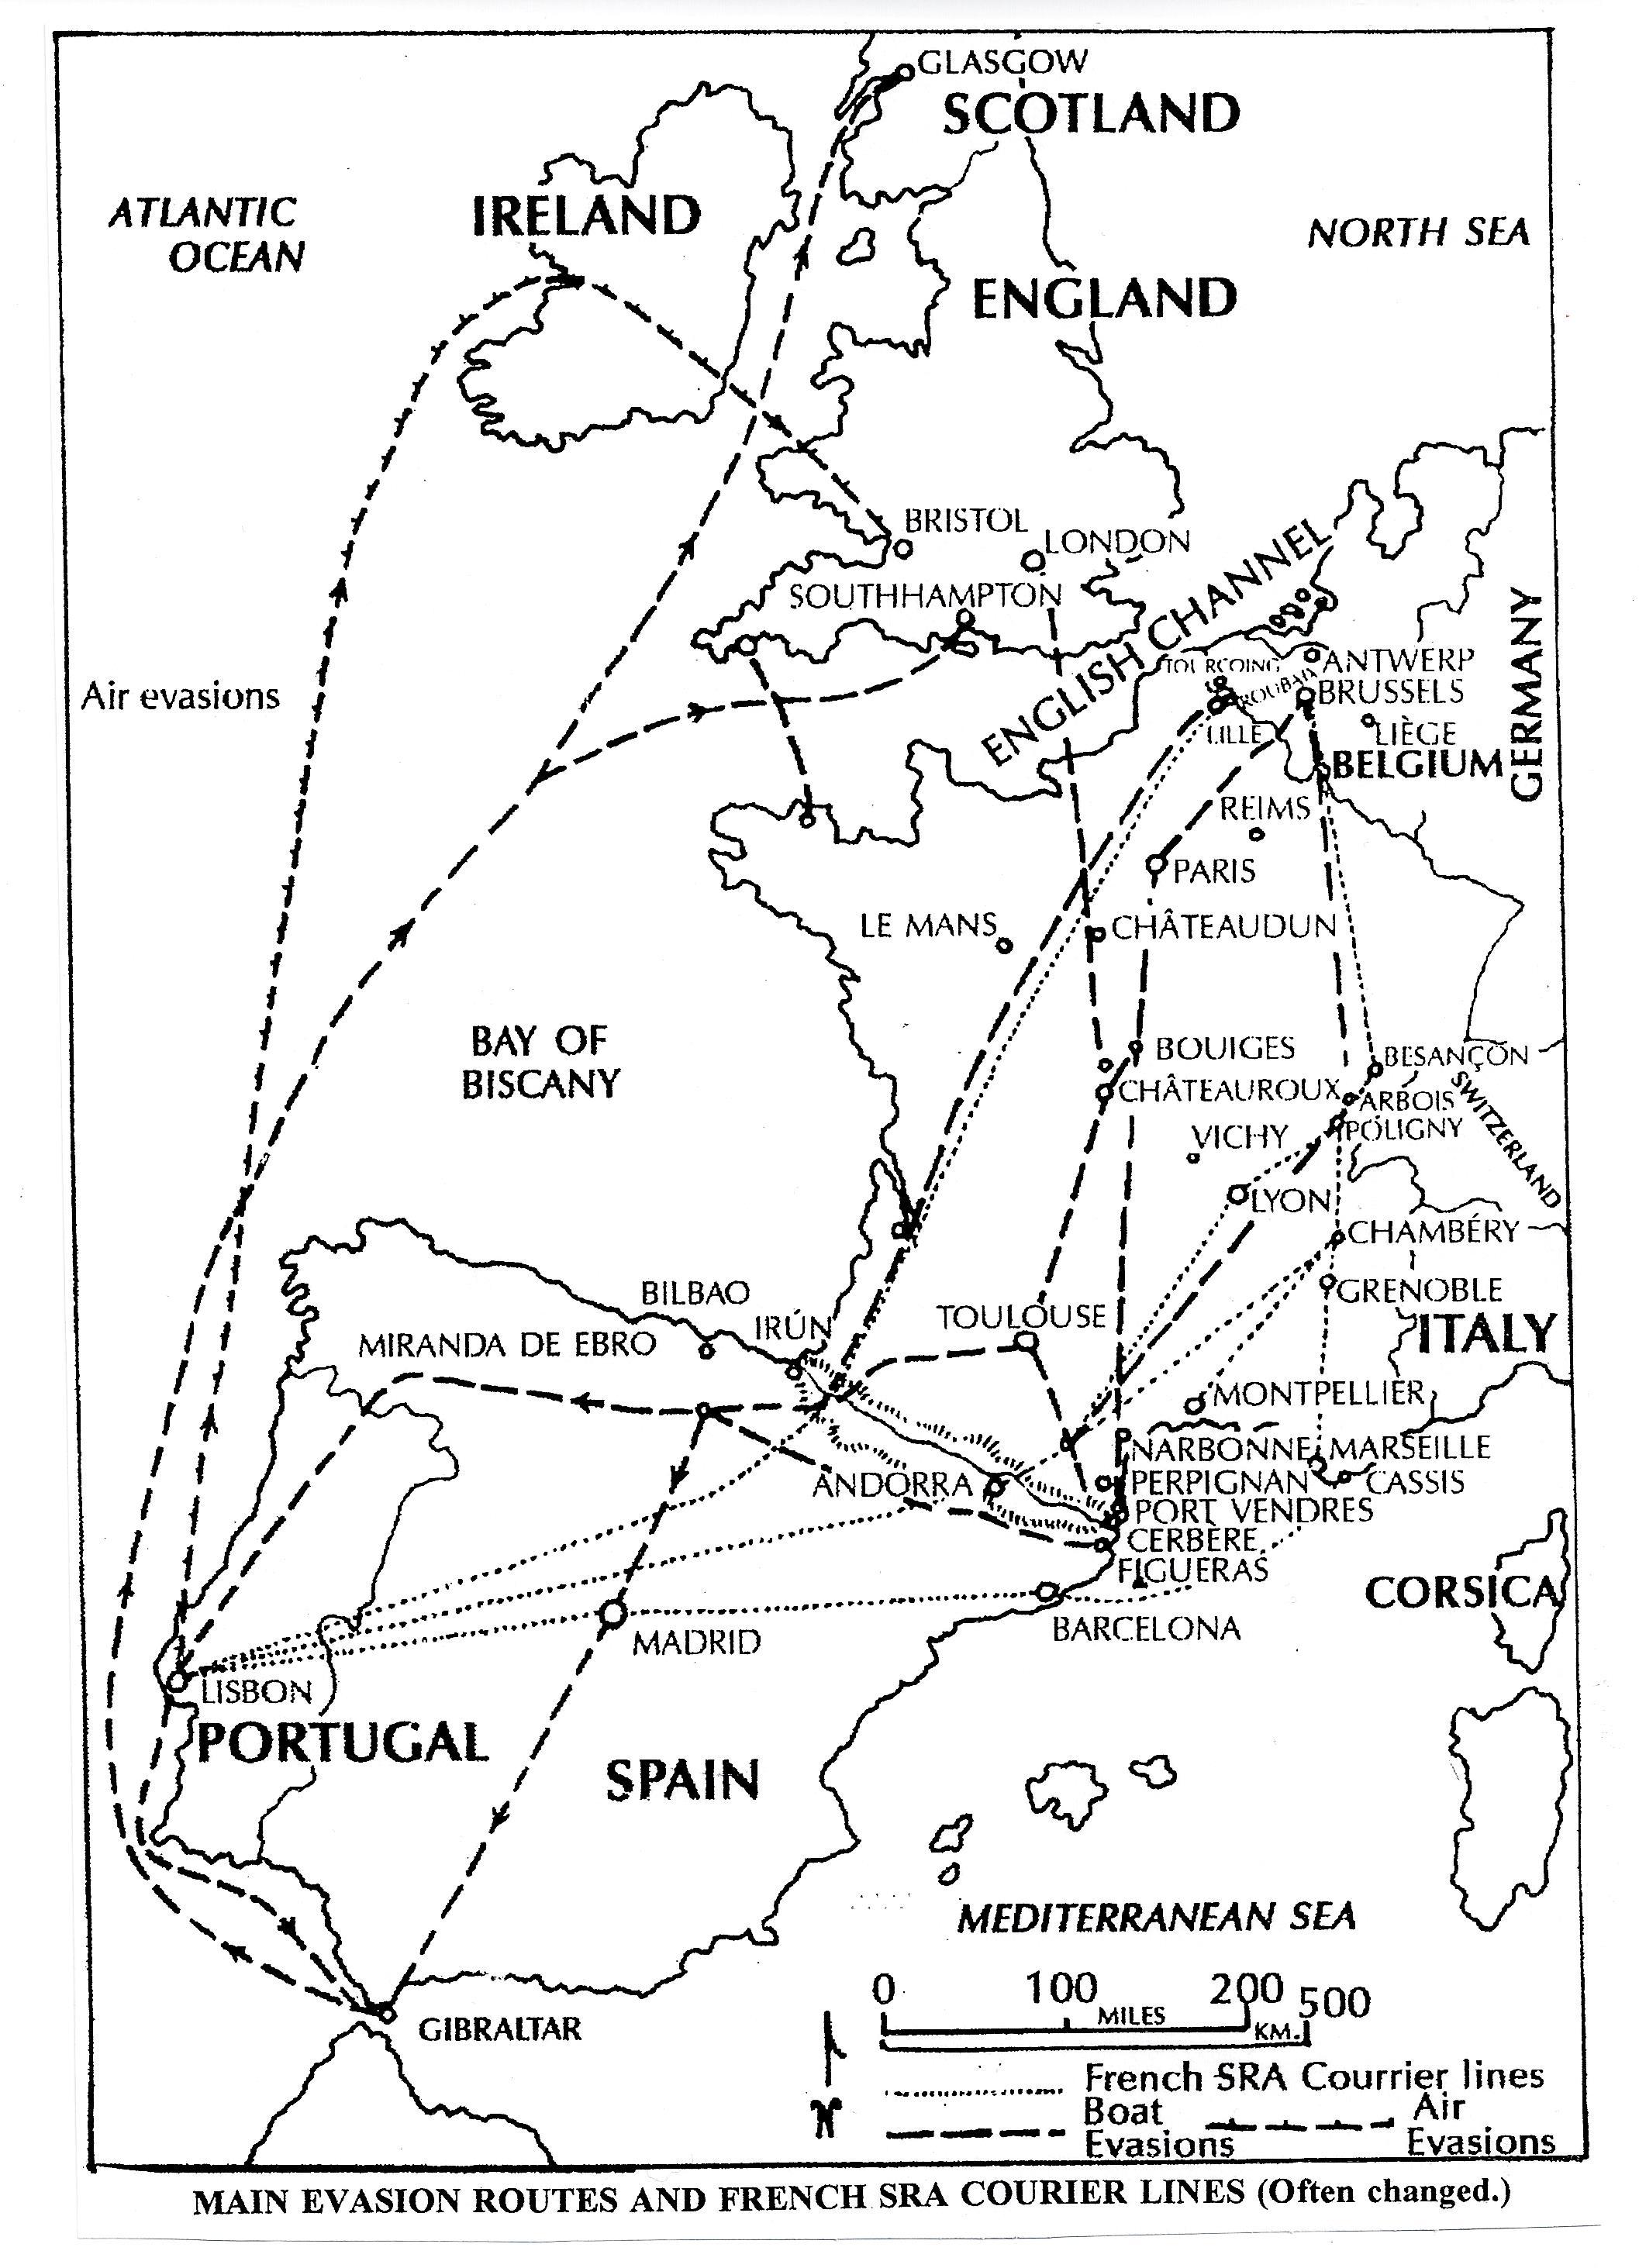 tgv france routes map auto electrical wiring diagram 1977 CJ5 Ignition Wiring Diagram 2011 dodge grand caravan engine diagram strobe light schematic cd4e transmission wiring diagram 1975 jeep cj5 wiring diagram